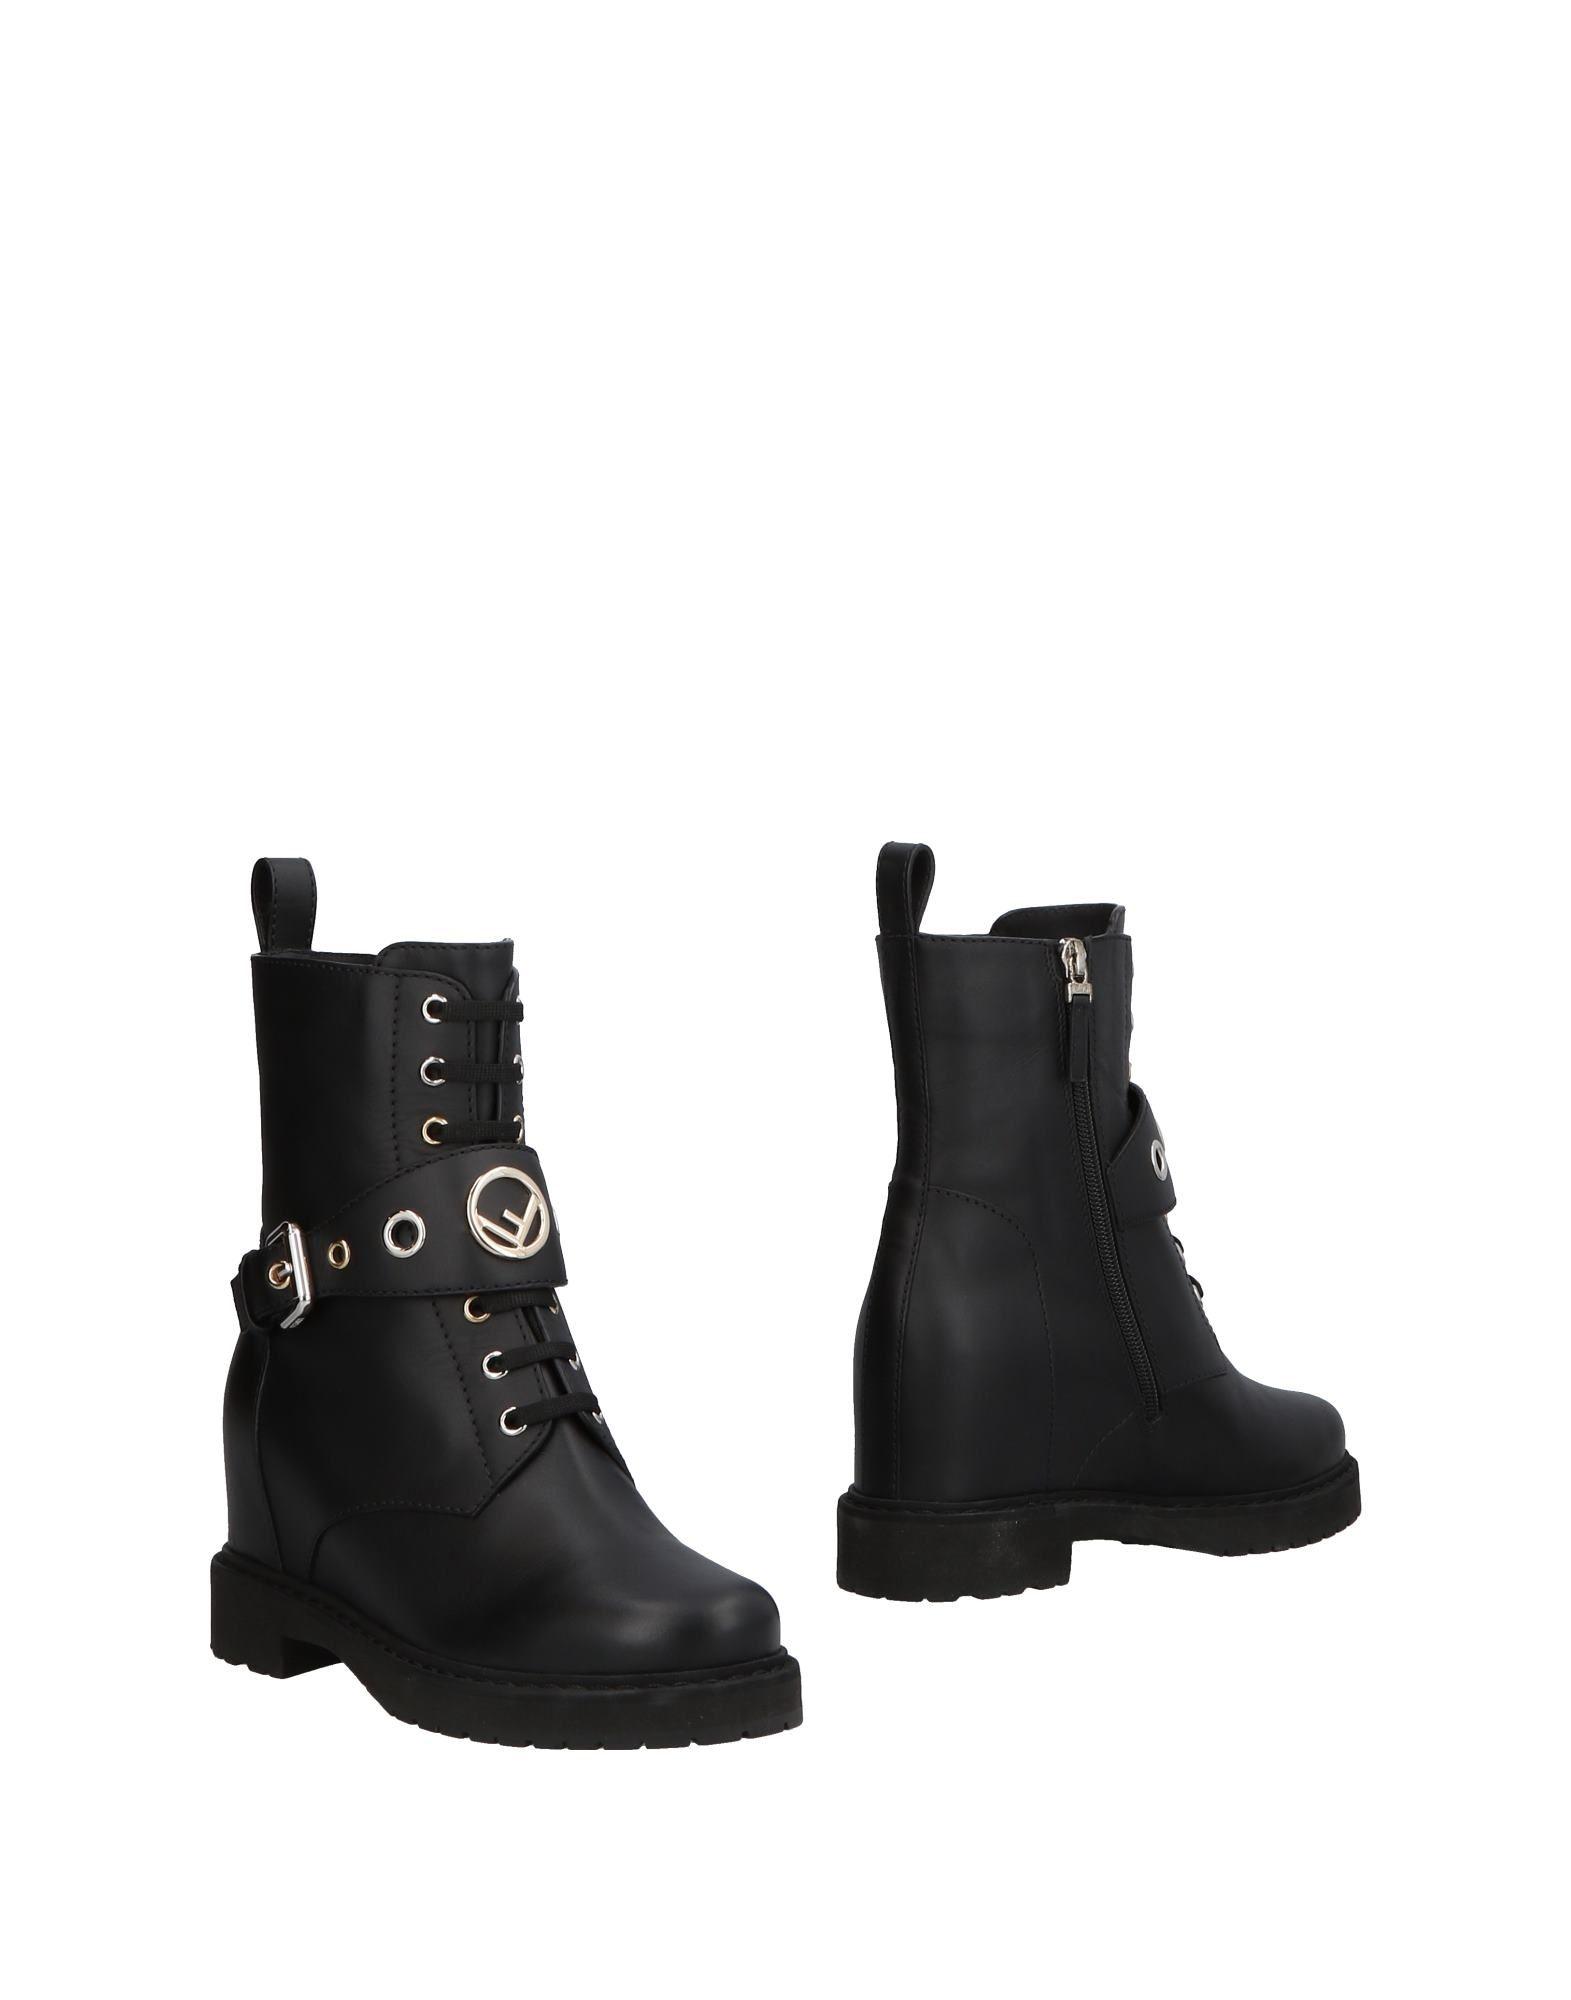 Fendi Fendi Ankle Boot - Women Fendi Fendi Ankle Boots online on  United Kingdom - 11500208WI 88a8ba